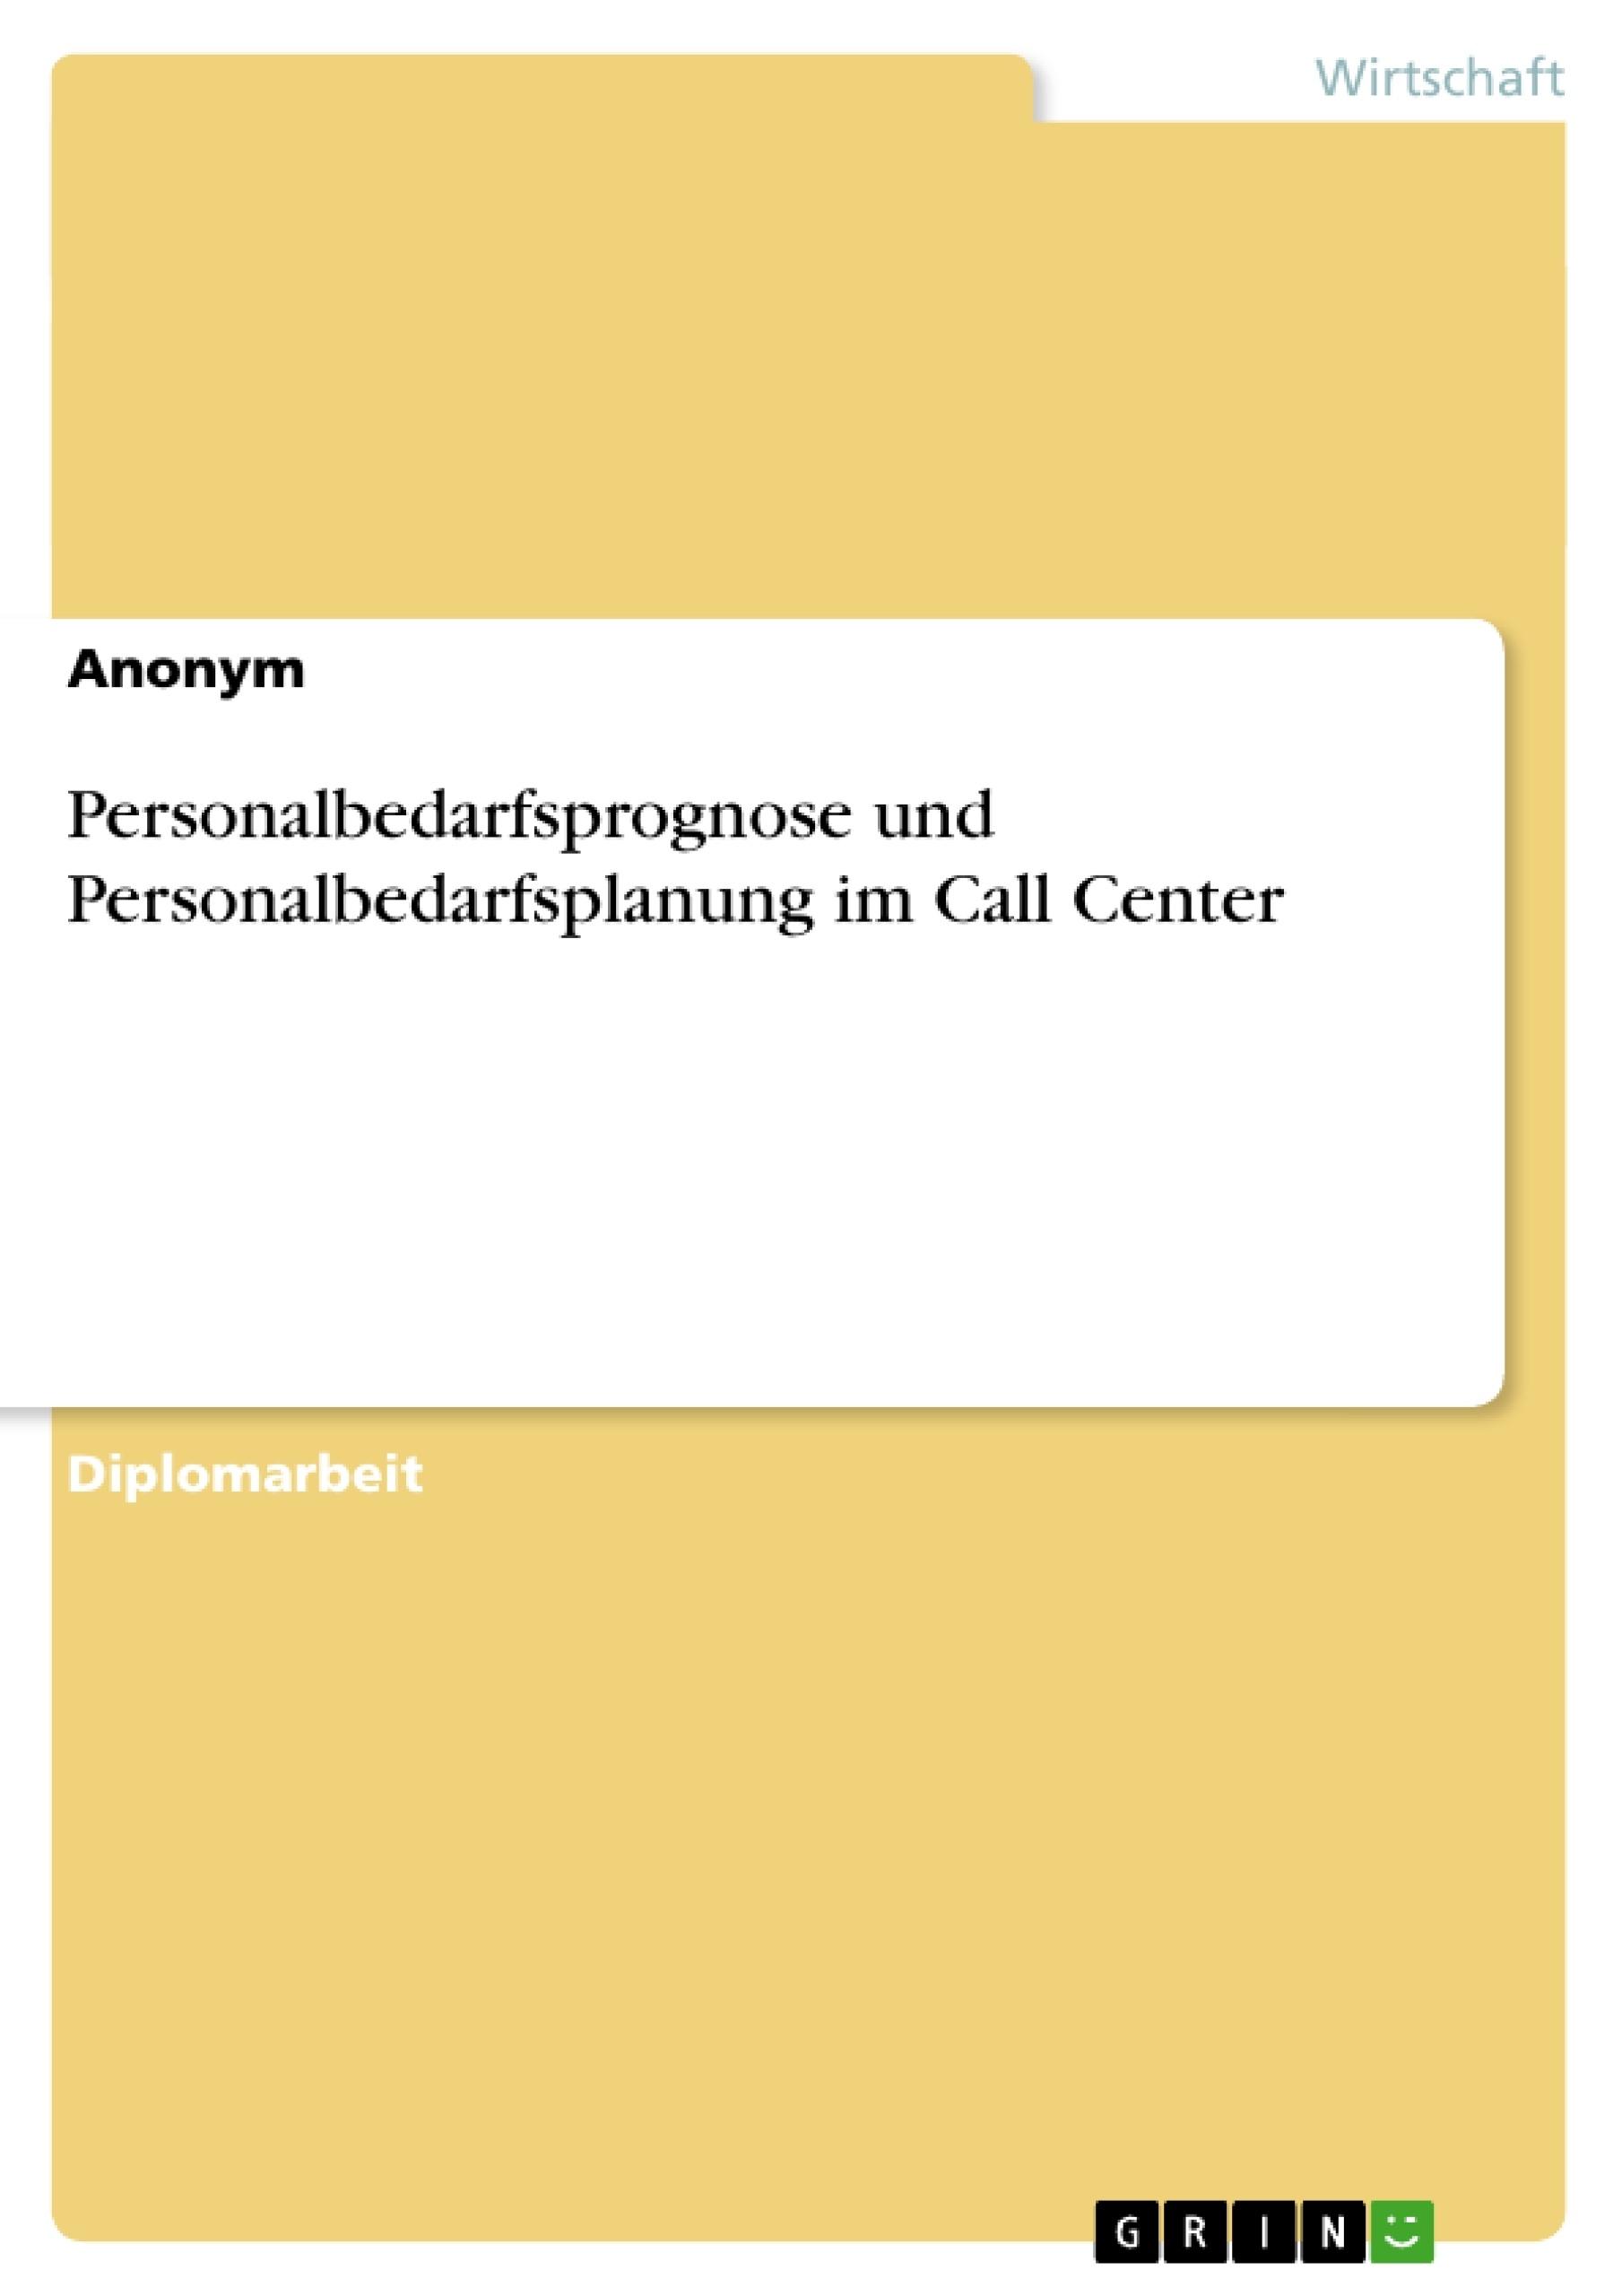 Titel: Personalbedarfsprognose und Personalbedarfsplanung im Call Center